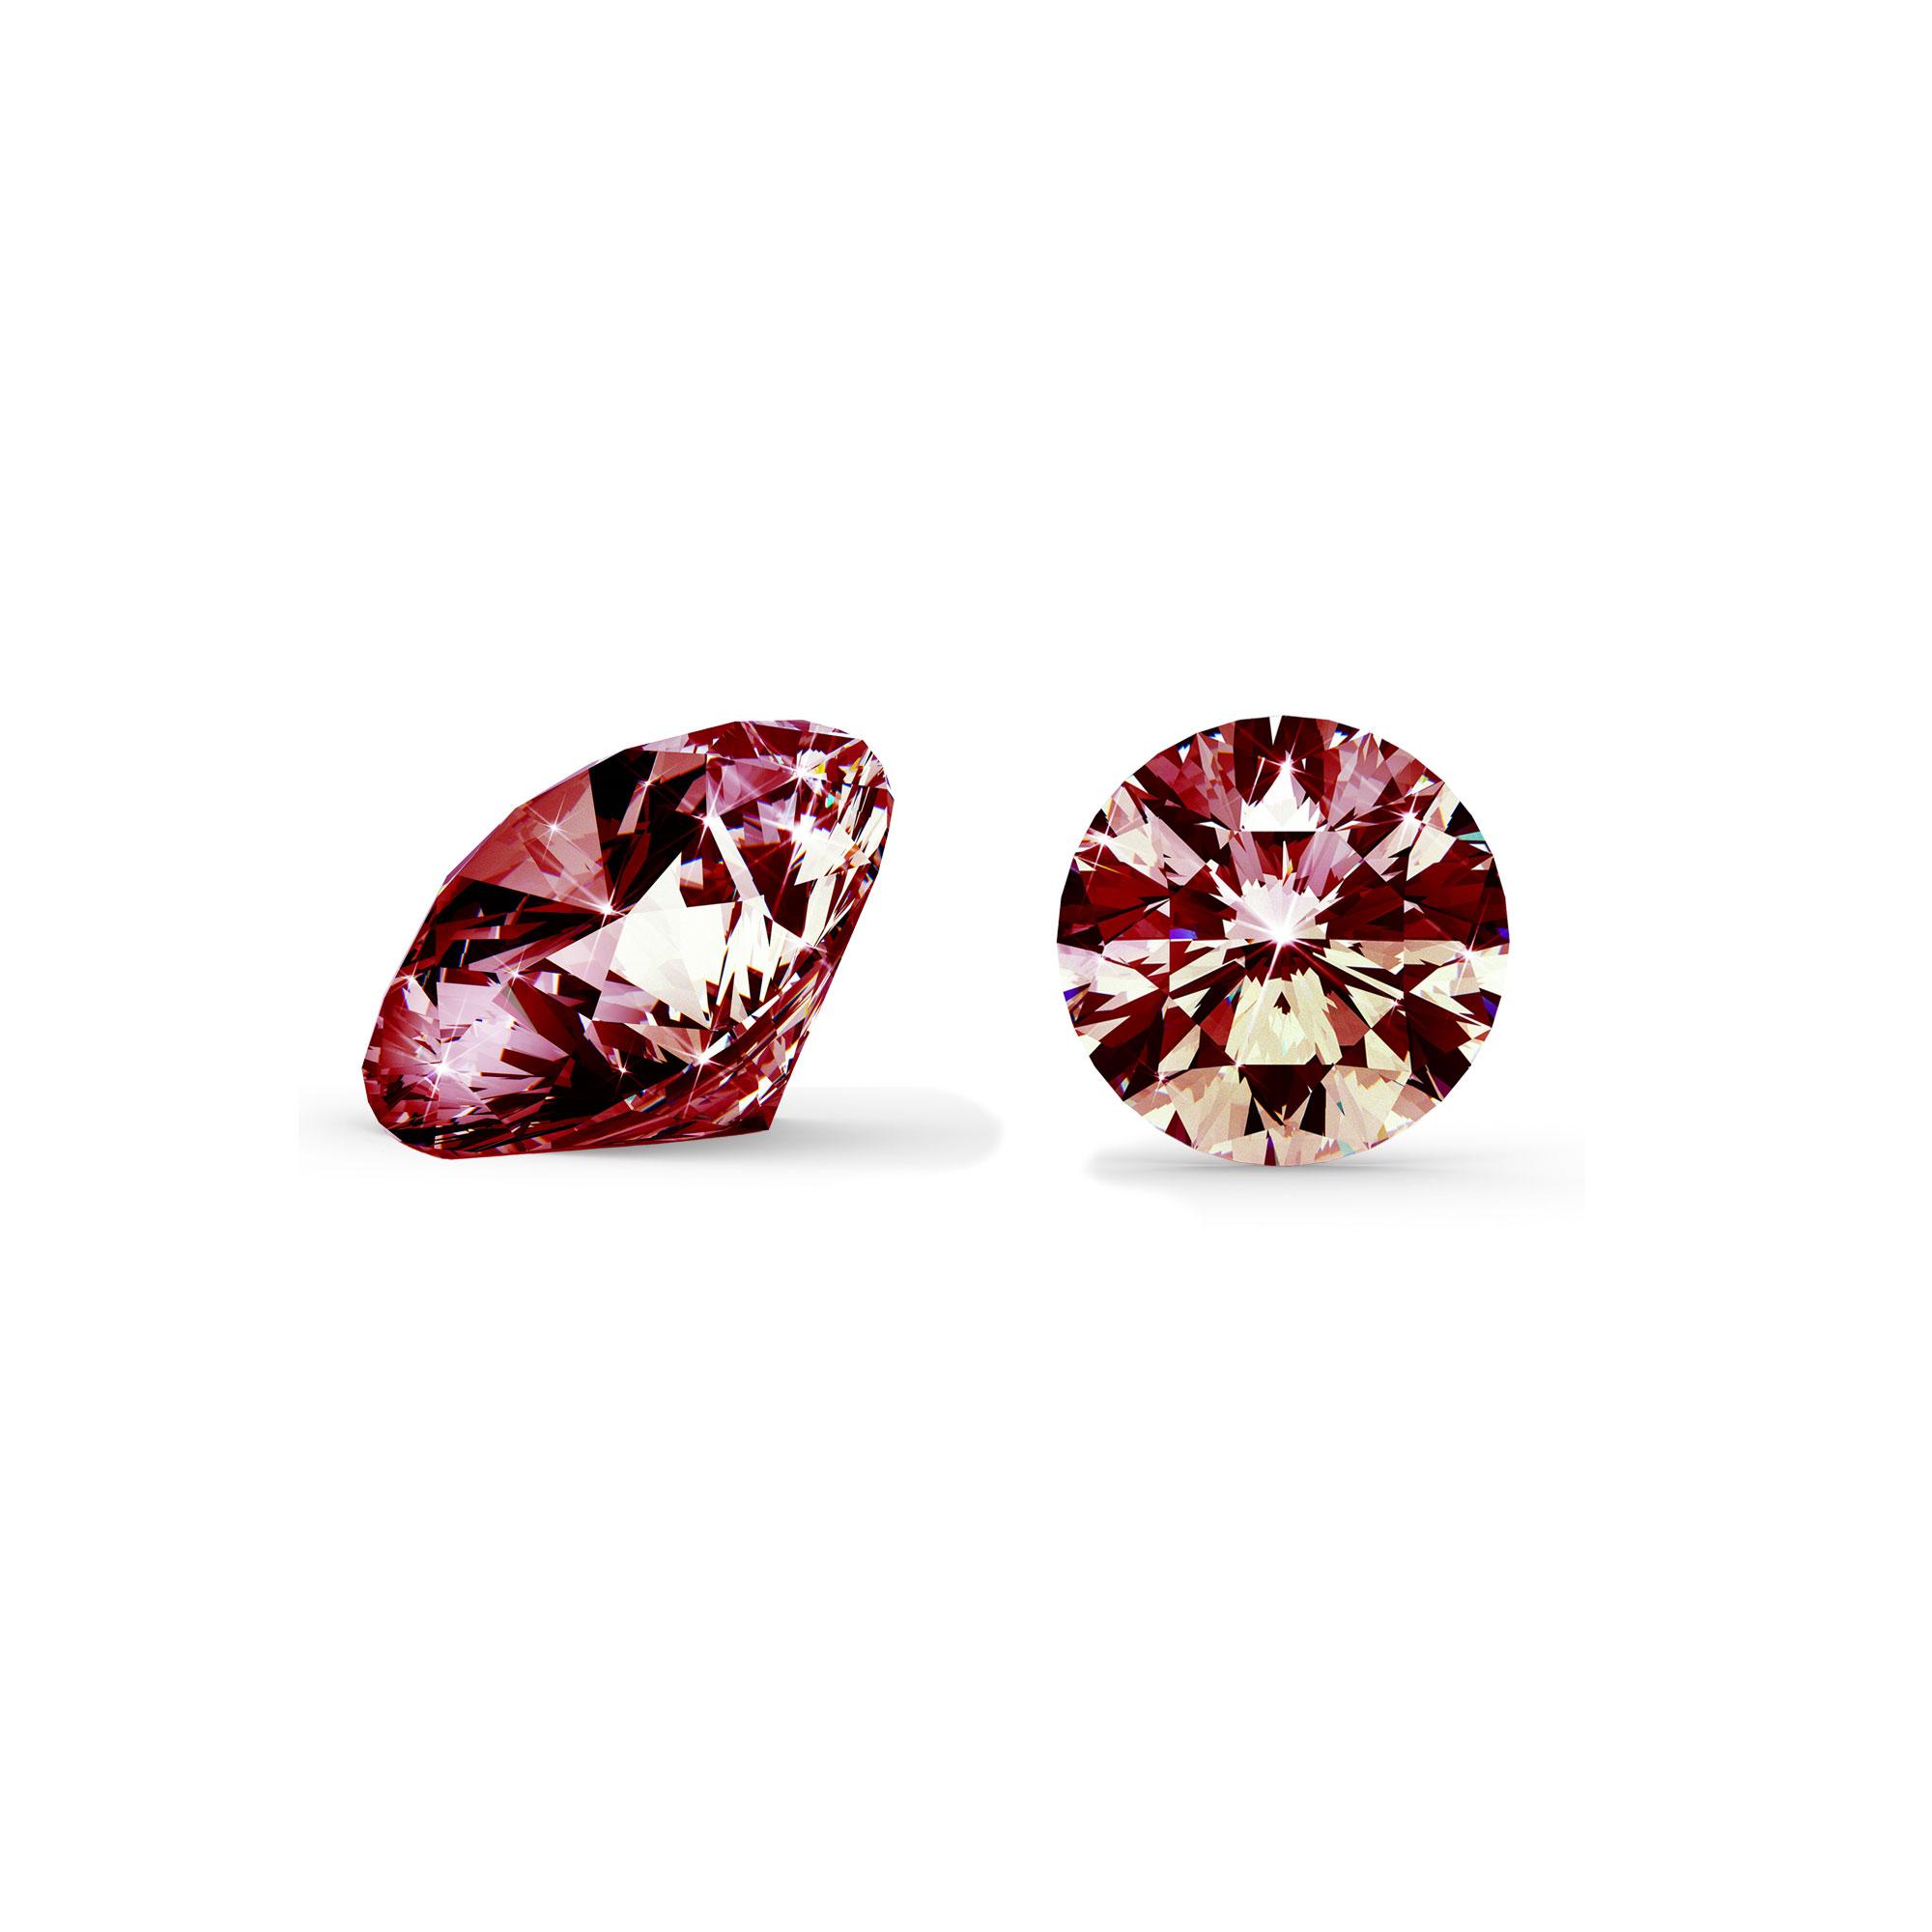 Rød diamant brilliant round cut side og top